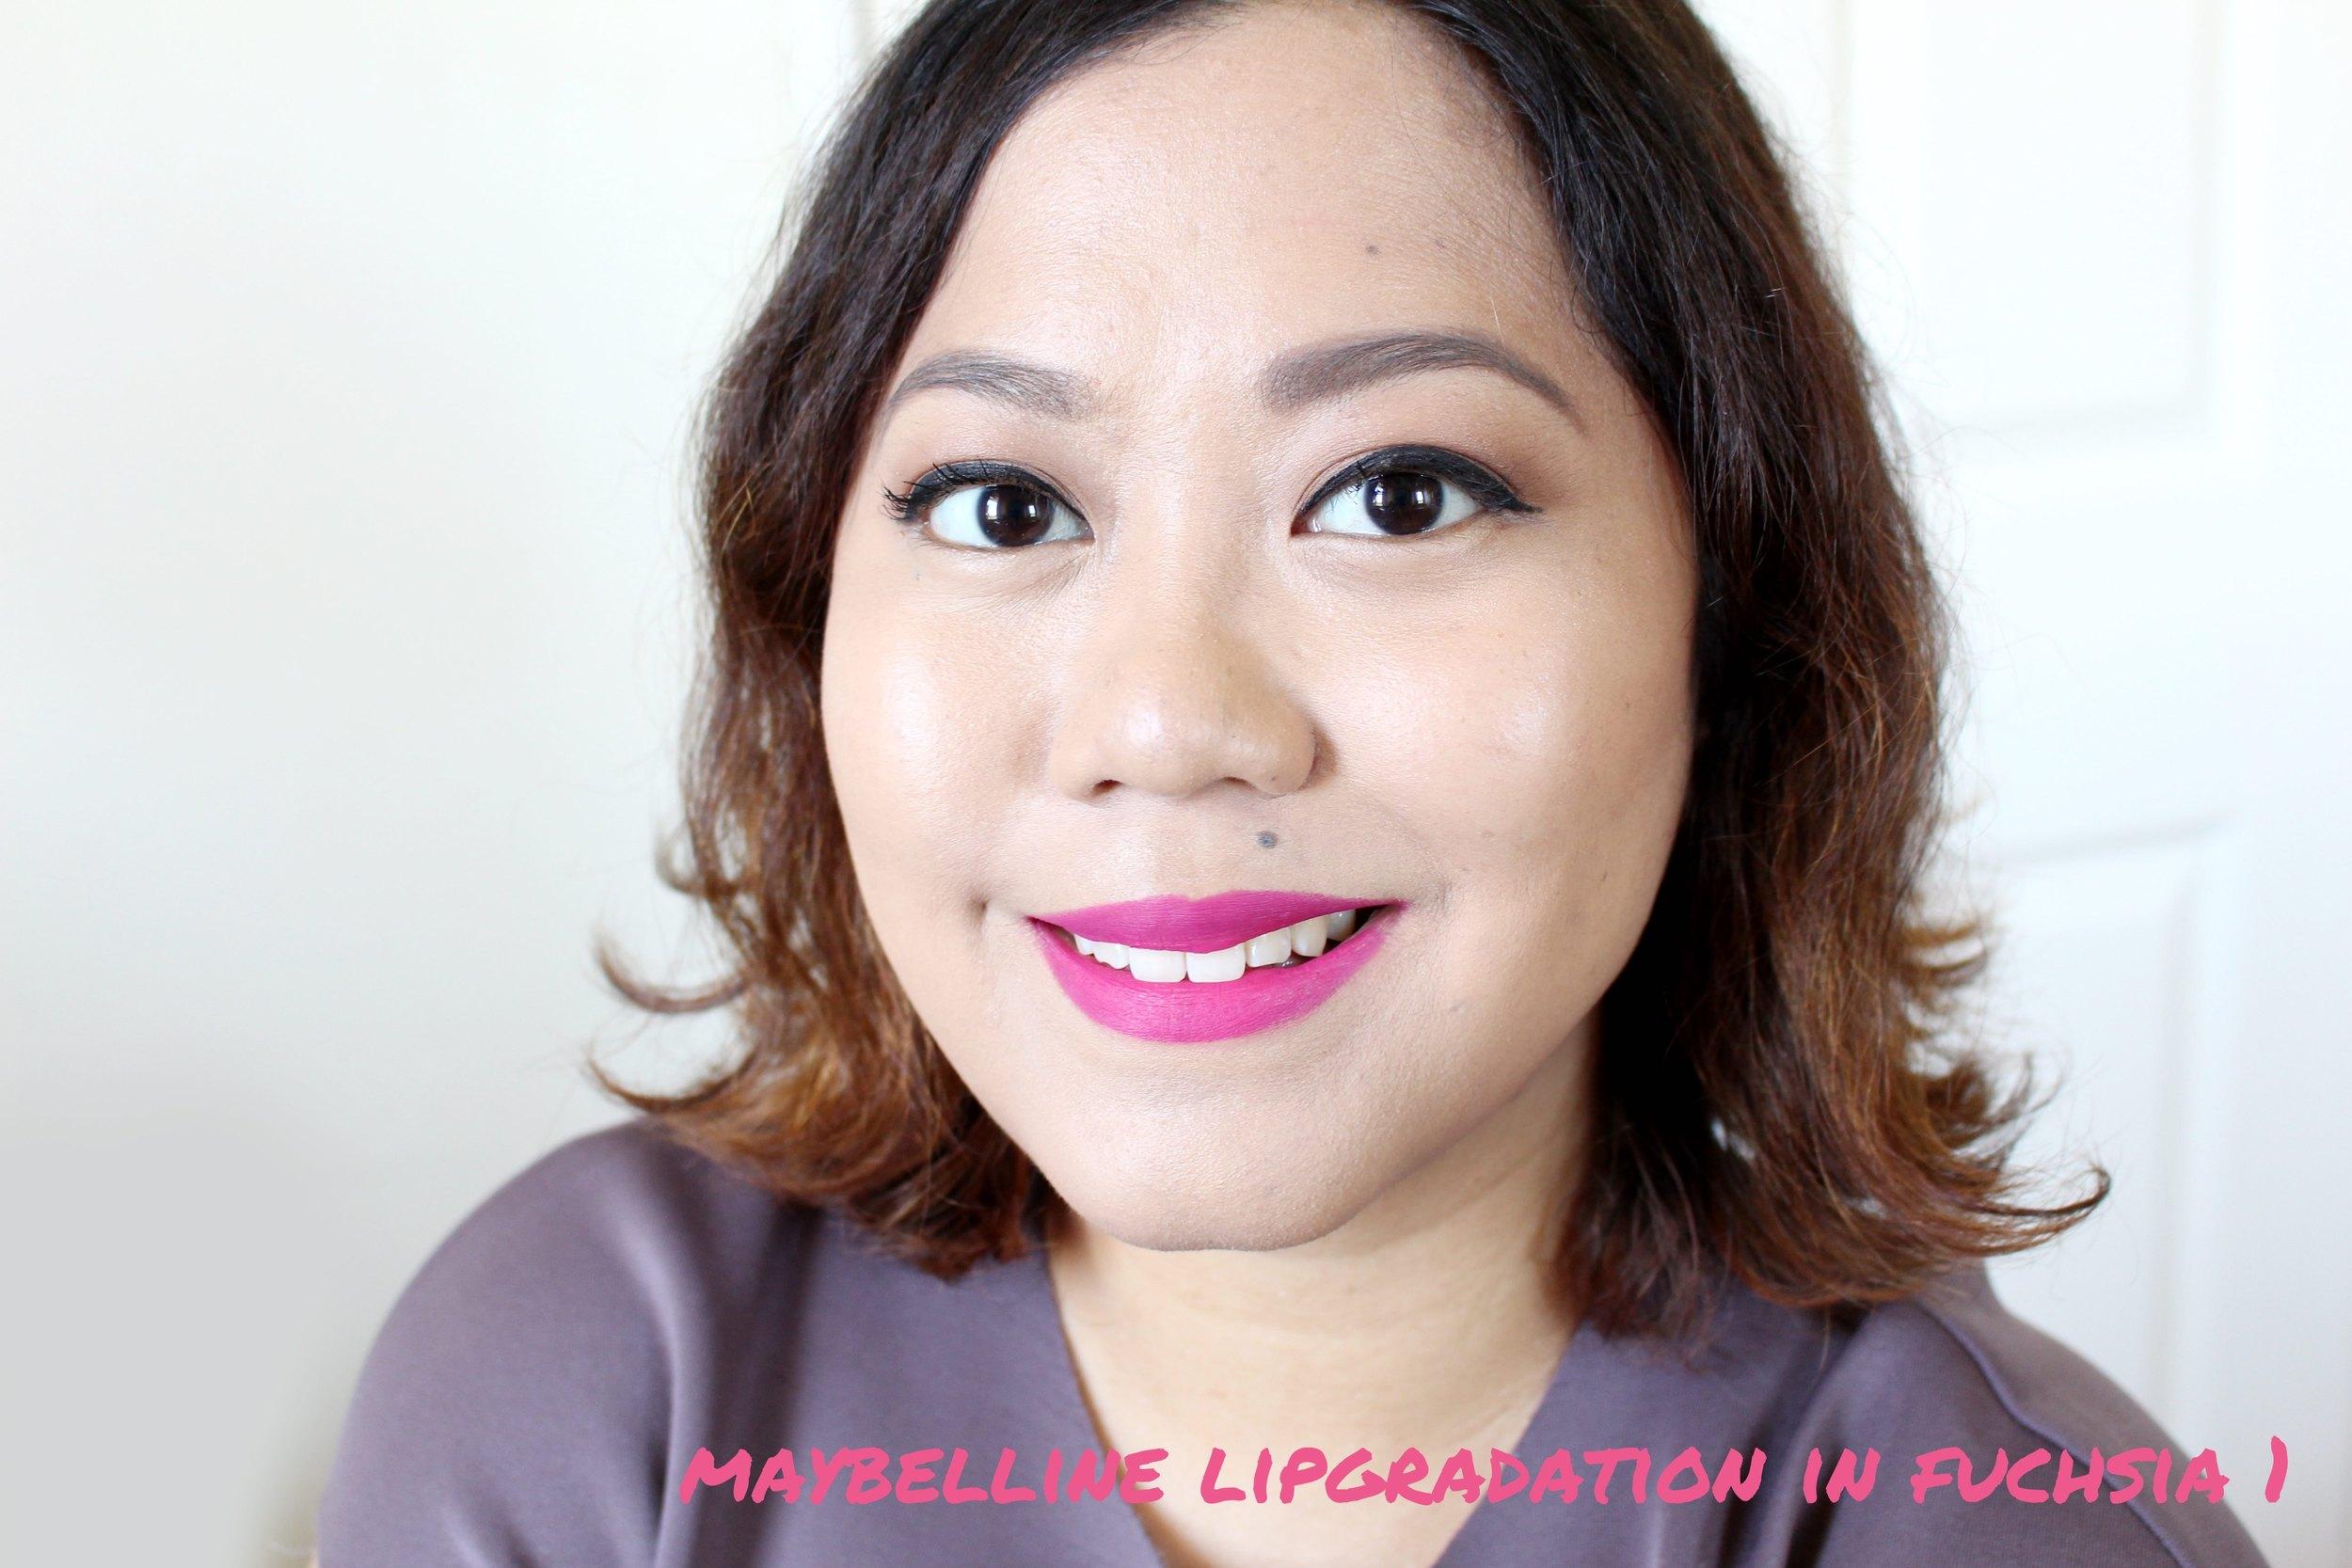 Maybelline Lipgradation fuchsia 1.jpg